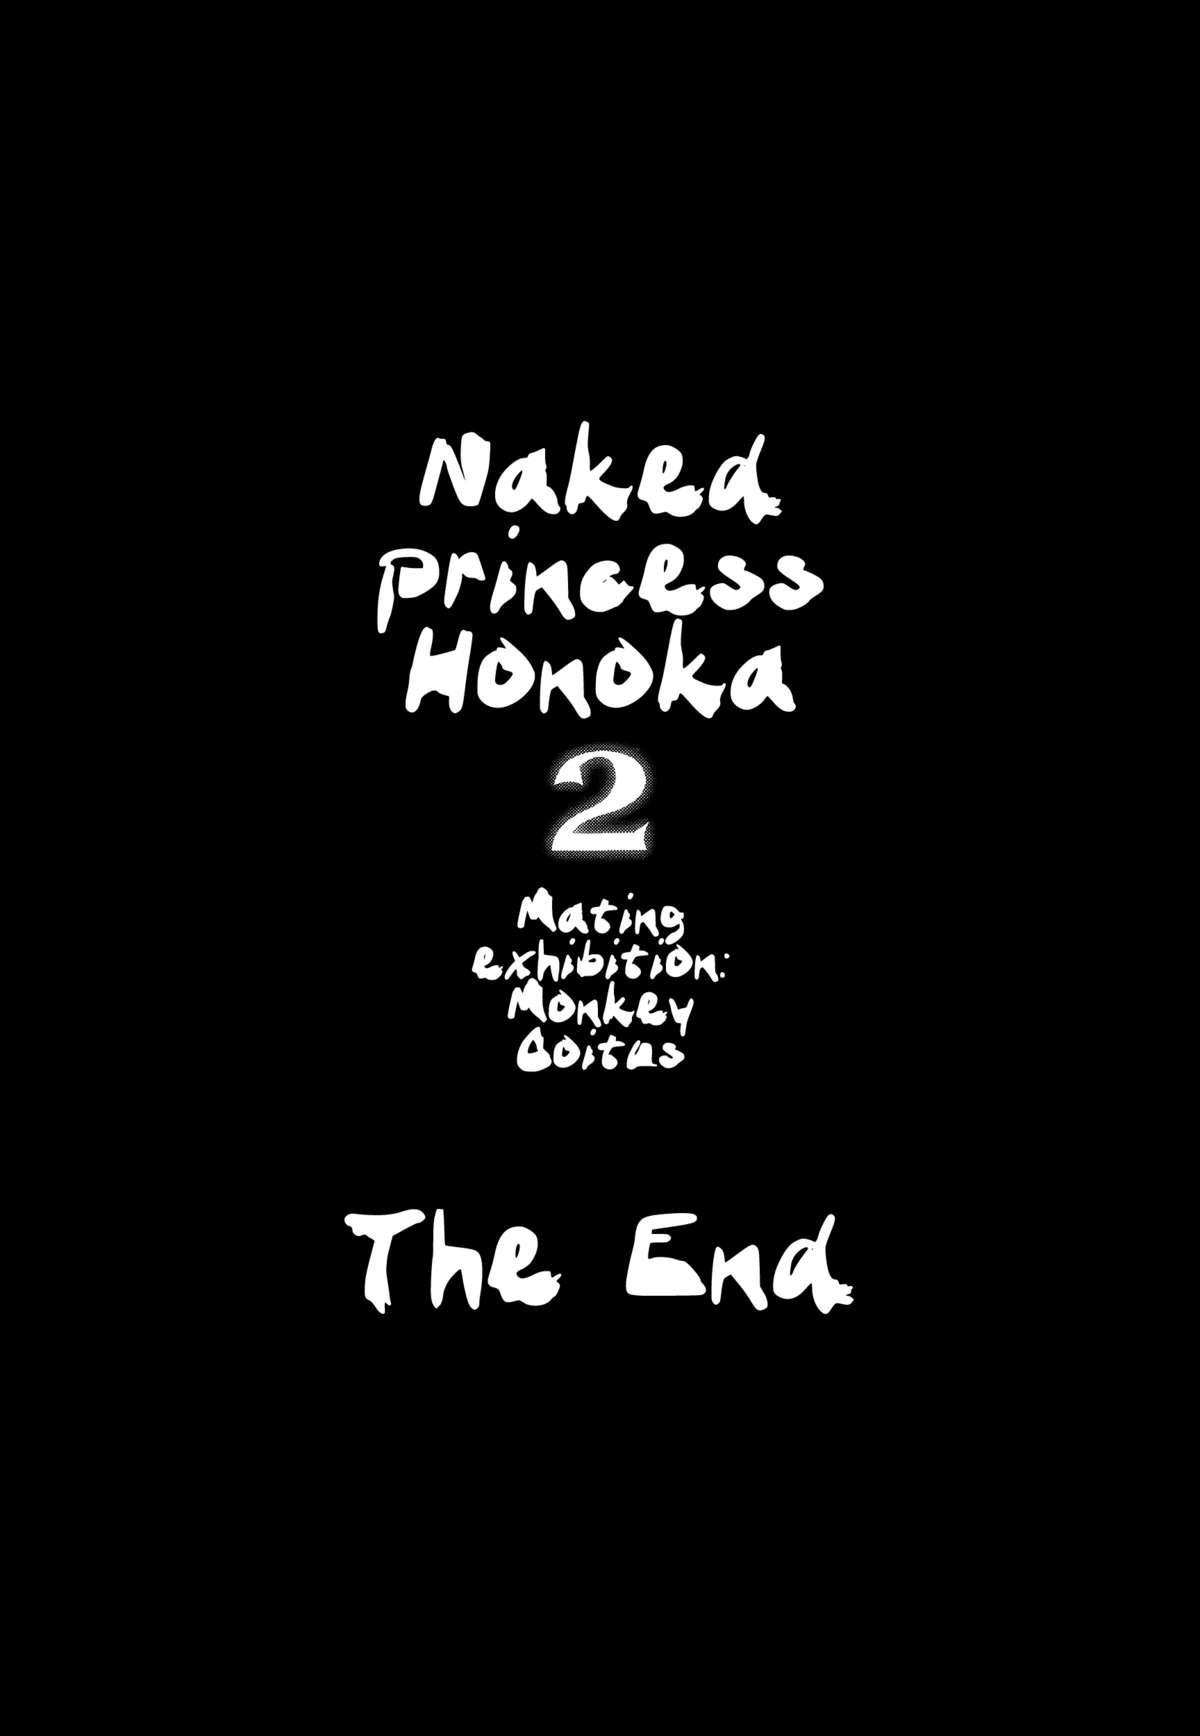 Hadakahime Honoka 2 Misemono Tanetsuke Saru Koubi | Naked Princess Honoka 2 - Mating Exhibition: Monkey Coitus 59